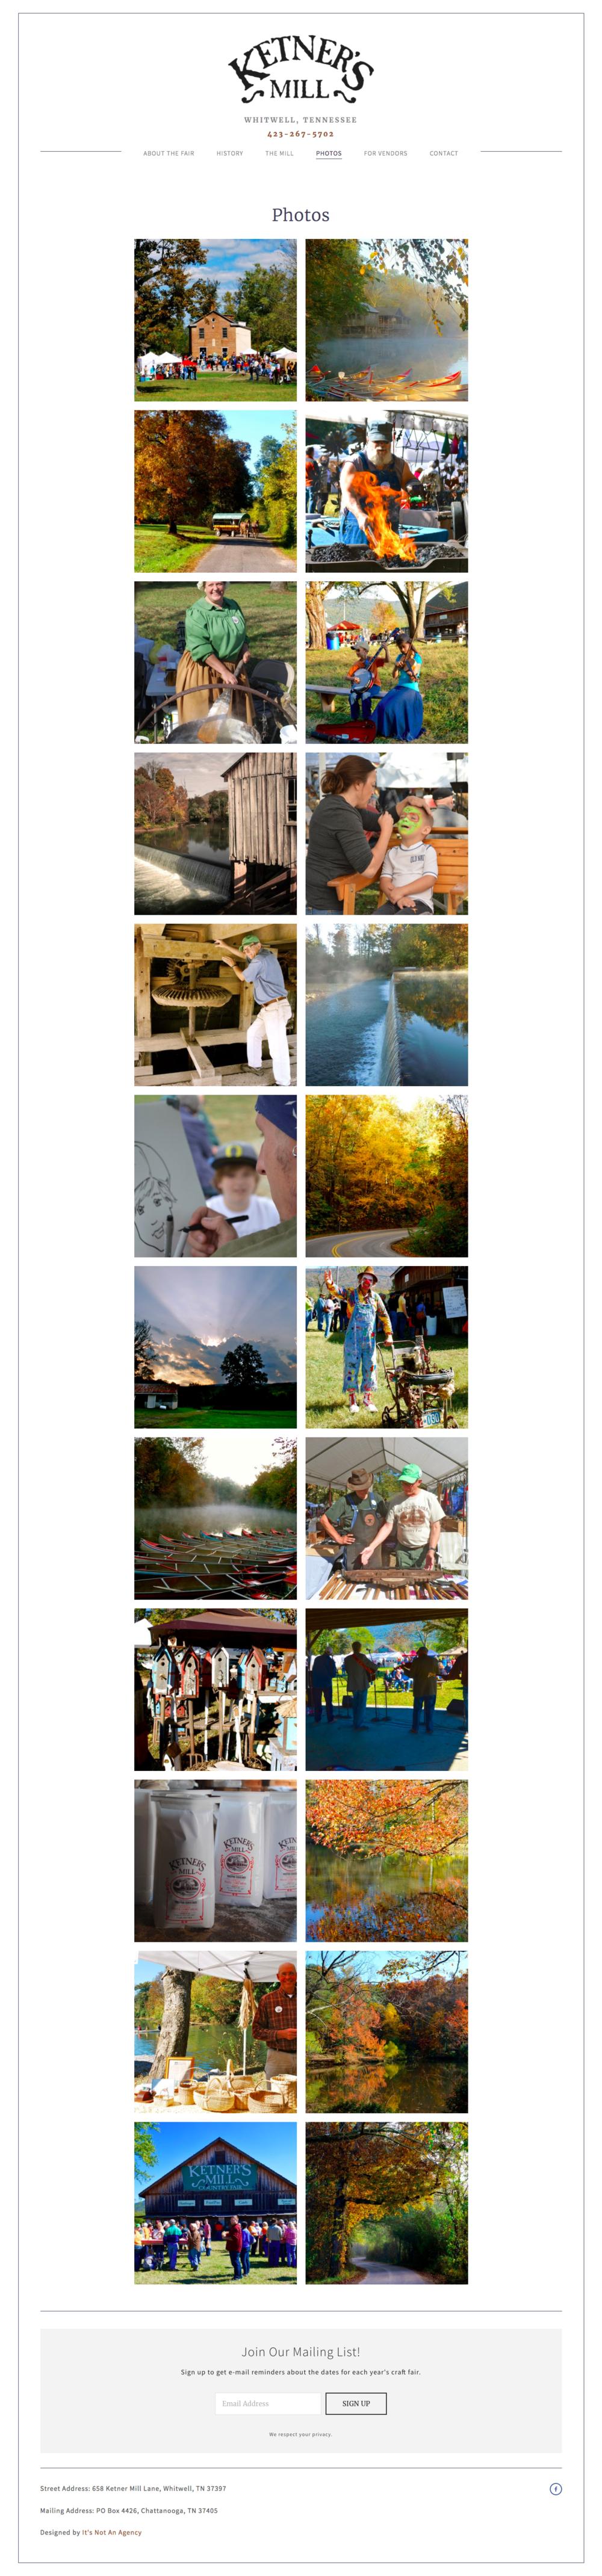 screencapture-ketnersmill-org-photos-1488820733960.png